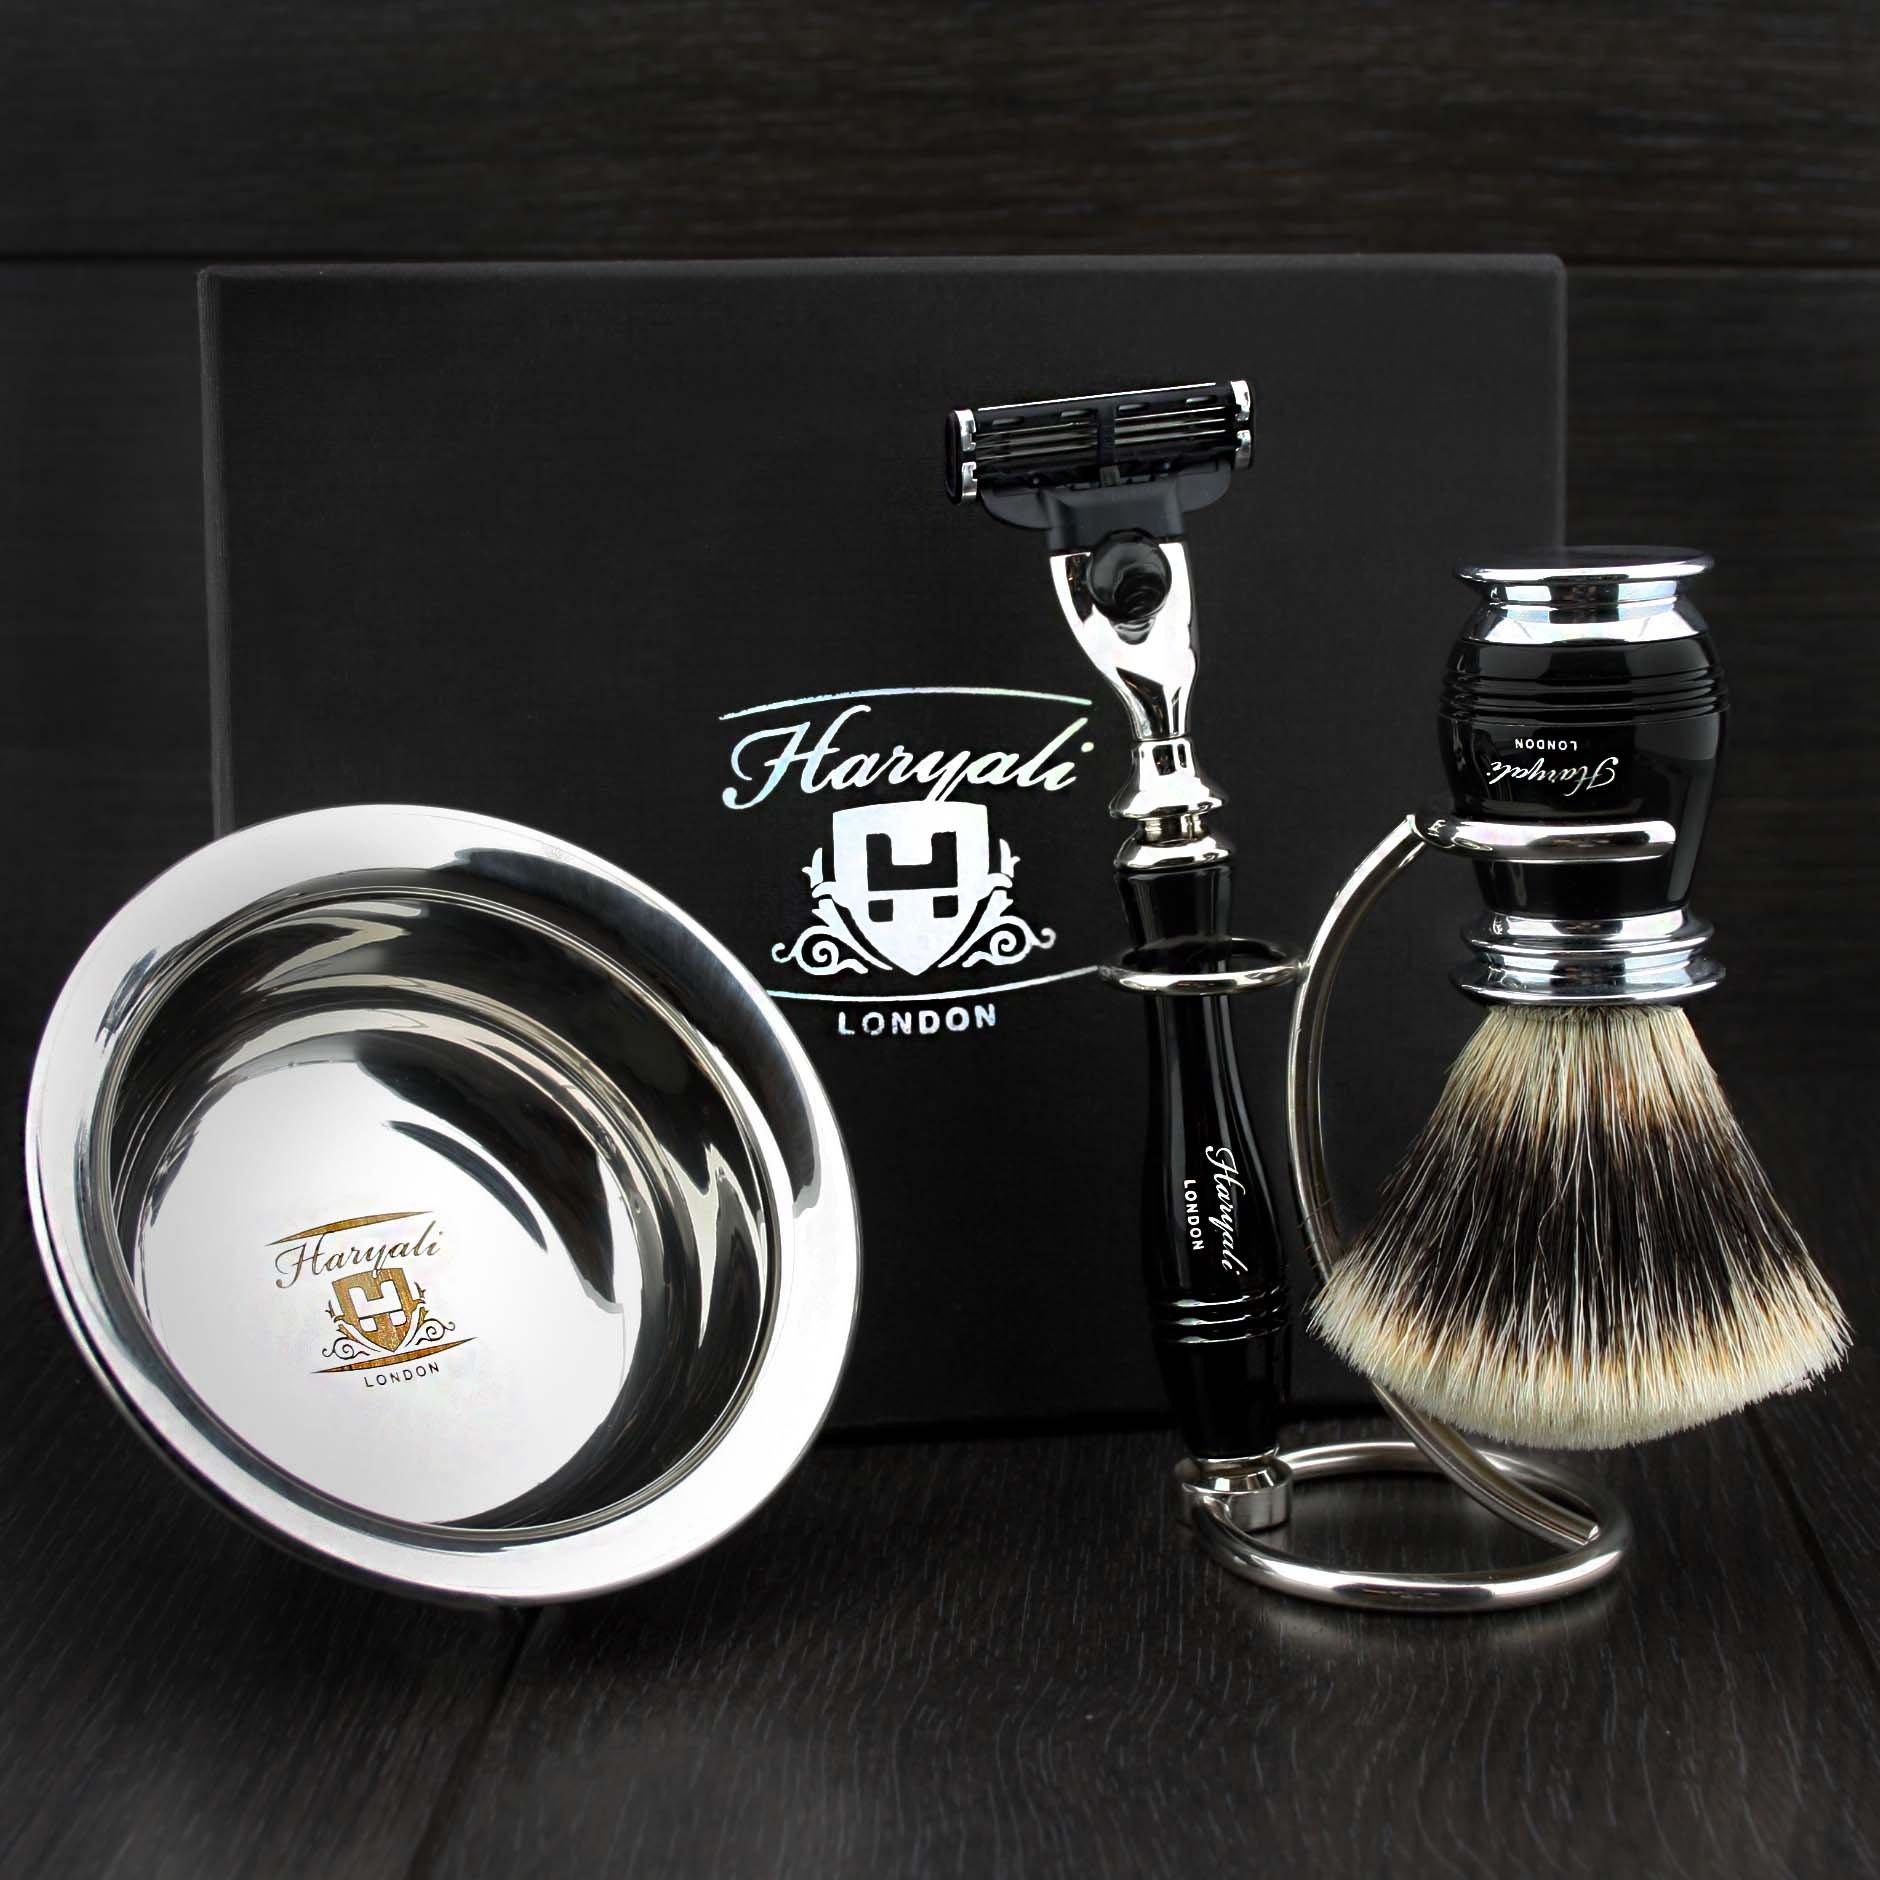 Men's Shaving Set In Black Colour ft Gillette Mach 3 Razor(Replaceable Head),Sliver Tip Badger Hair Brush, Dual Stand for Both Razor&Brush and Stainless Steel Bowl.Perfect 4 PCs Gift Kit for Him